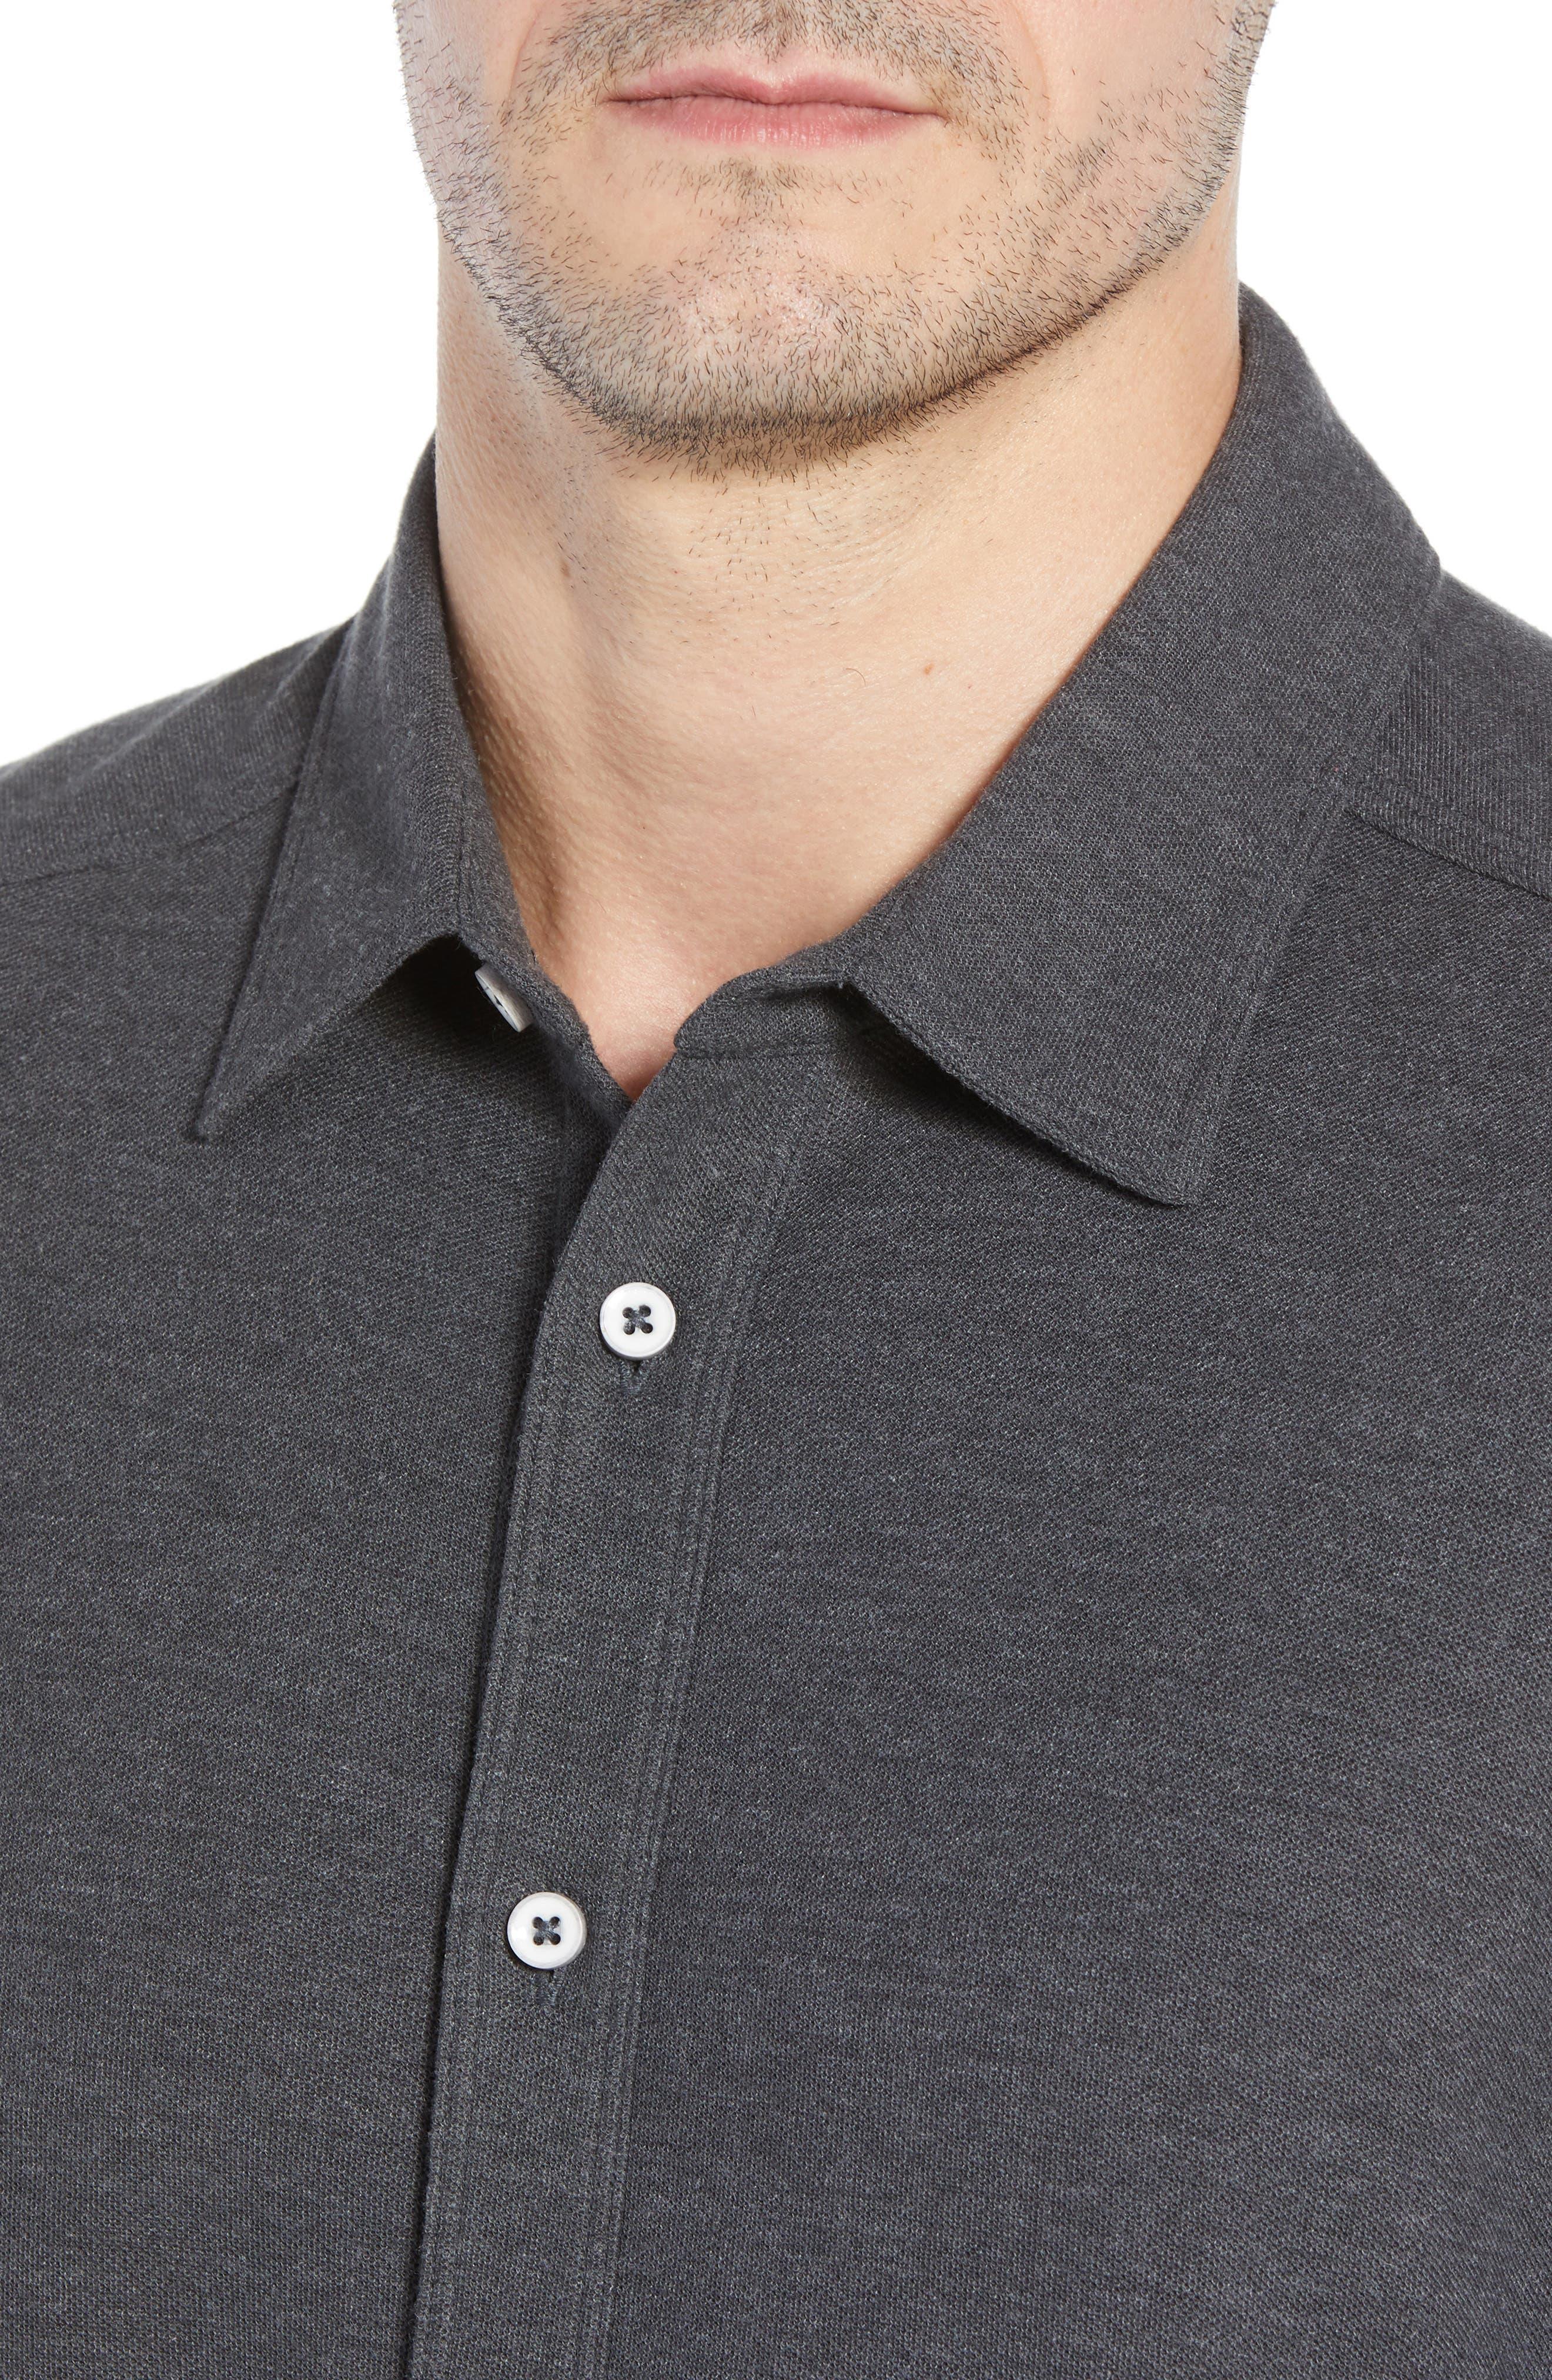 LA Vista Tropicool Regular Fit Sport Shirt,                             Alternate thumbnail 2, color,                             050